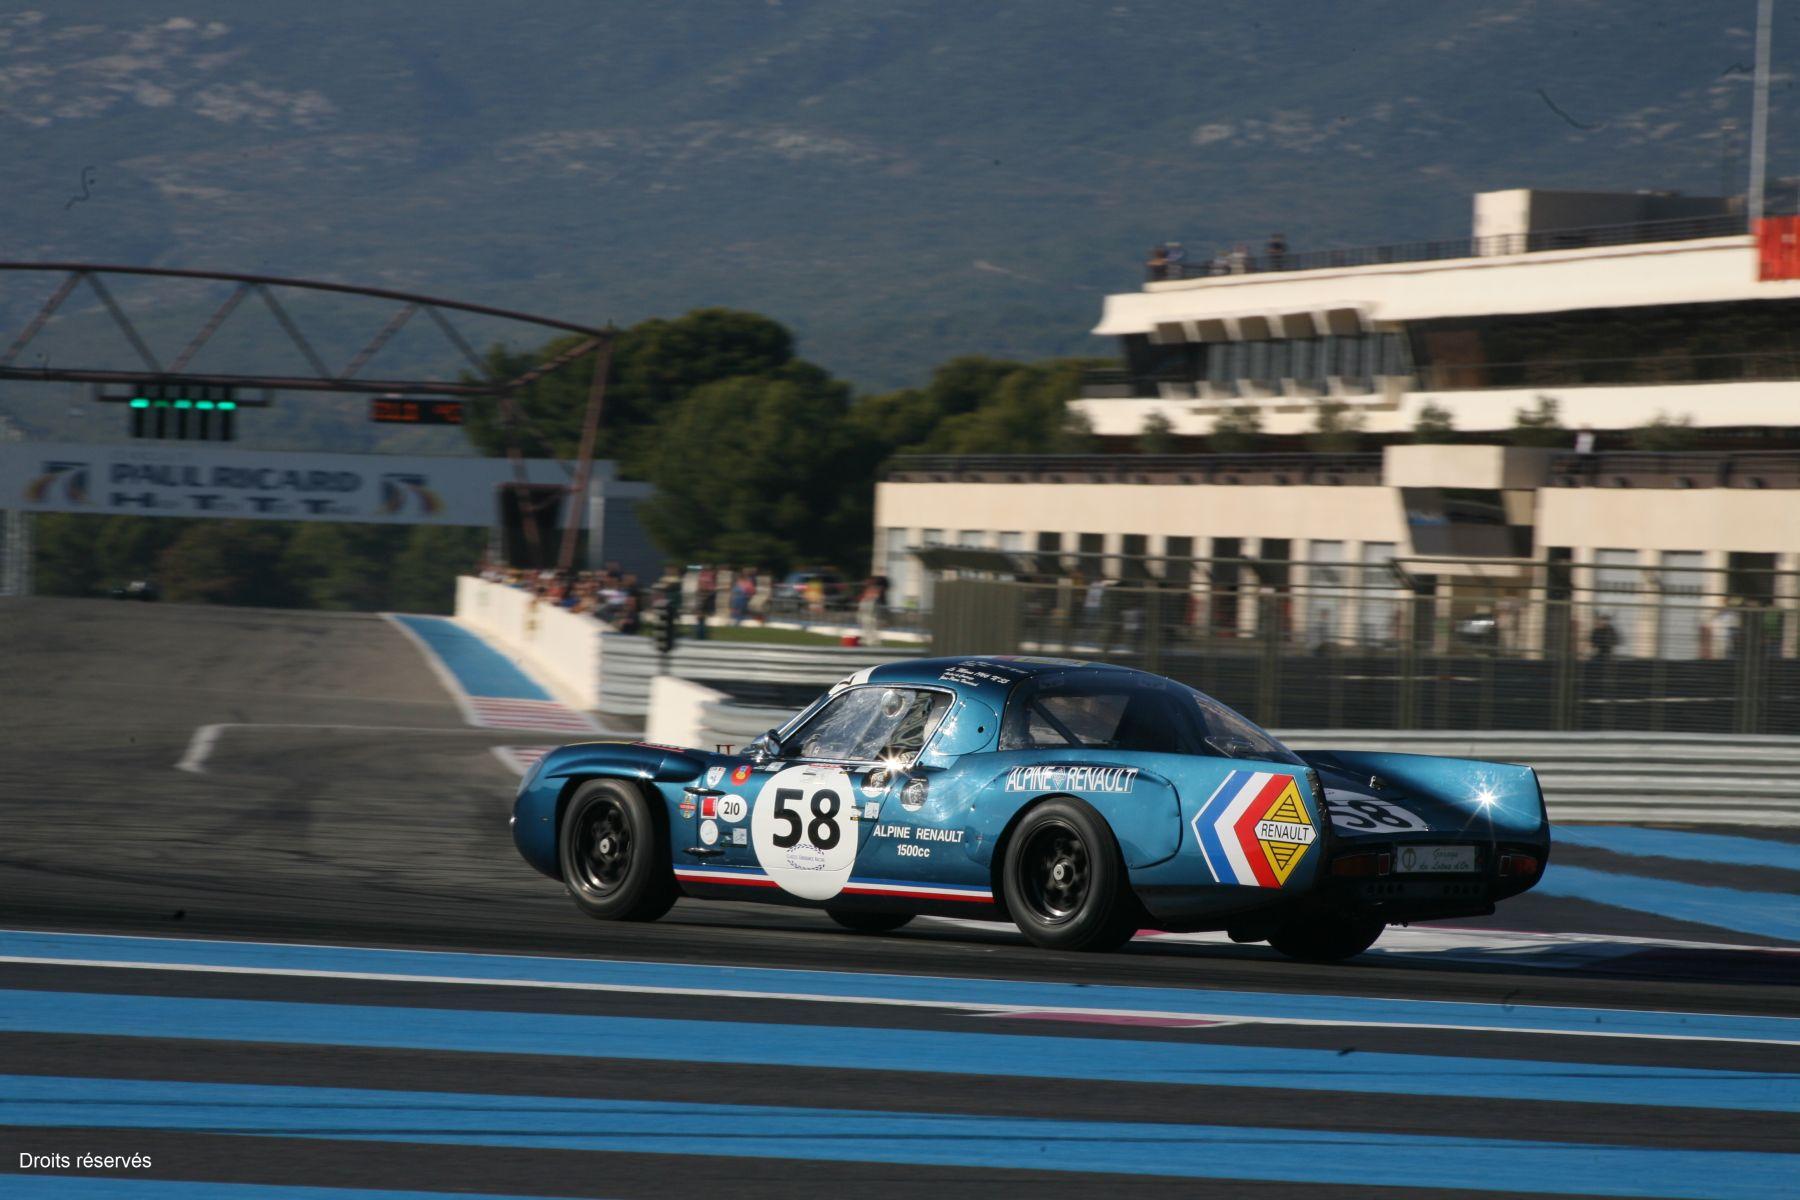 Alpine A210 Le Mans 1966 classicdriver com 20_3